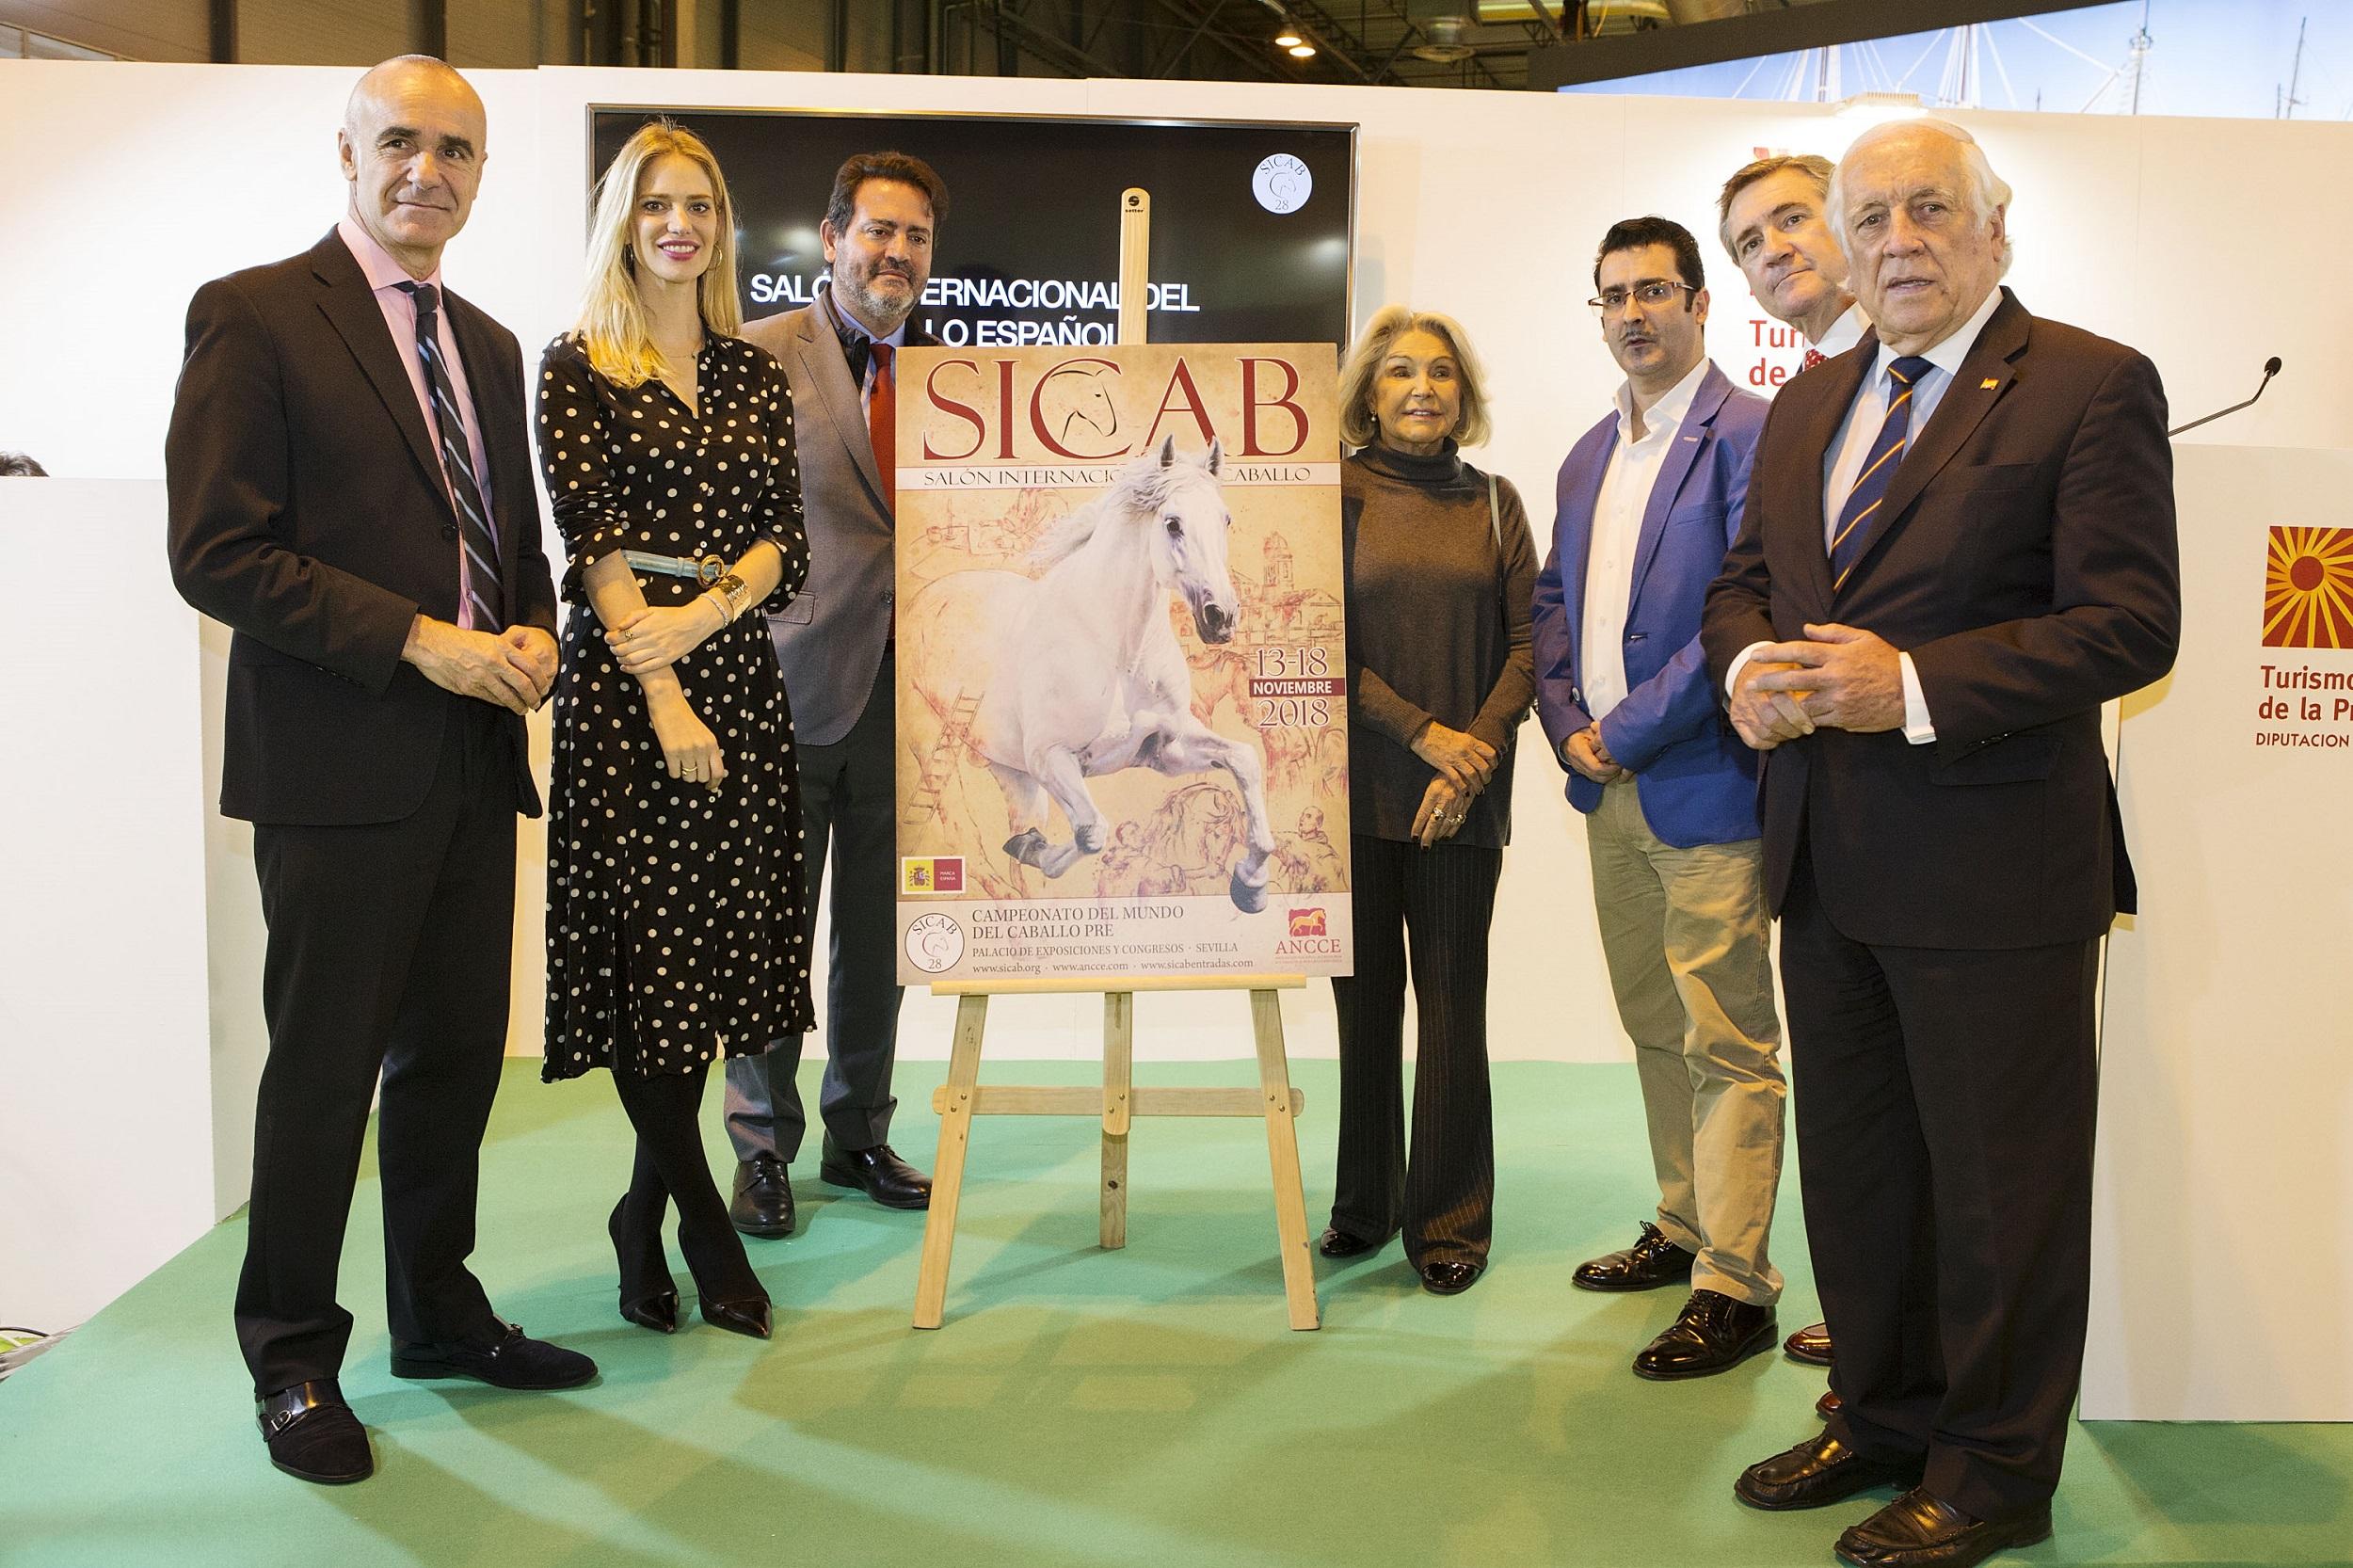 SICAB 2018 in Seville